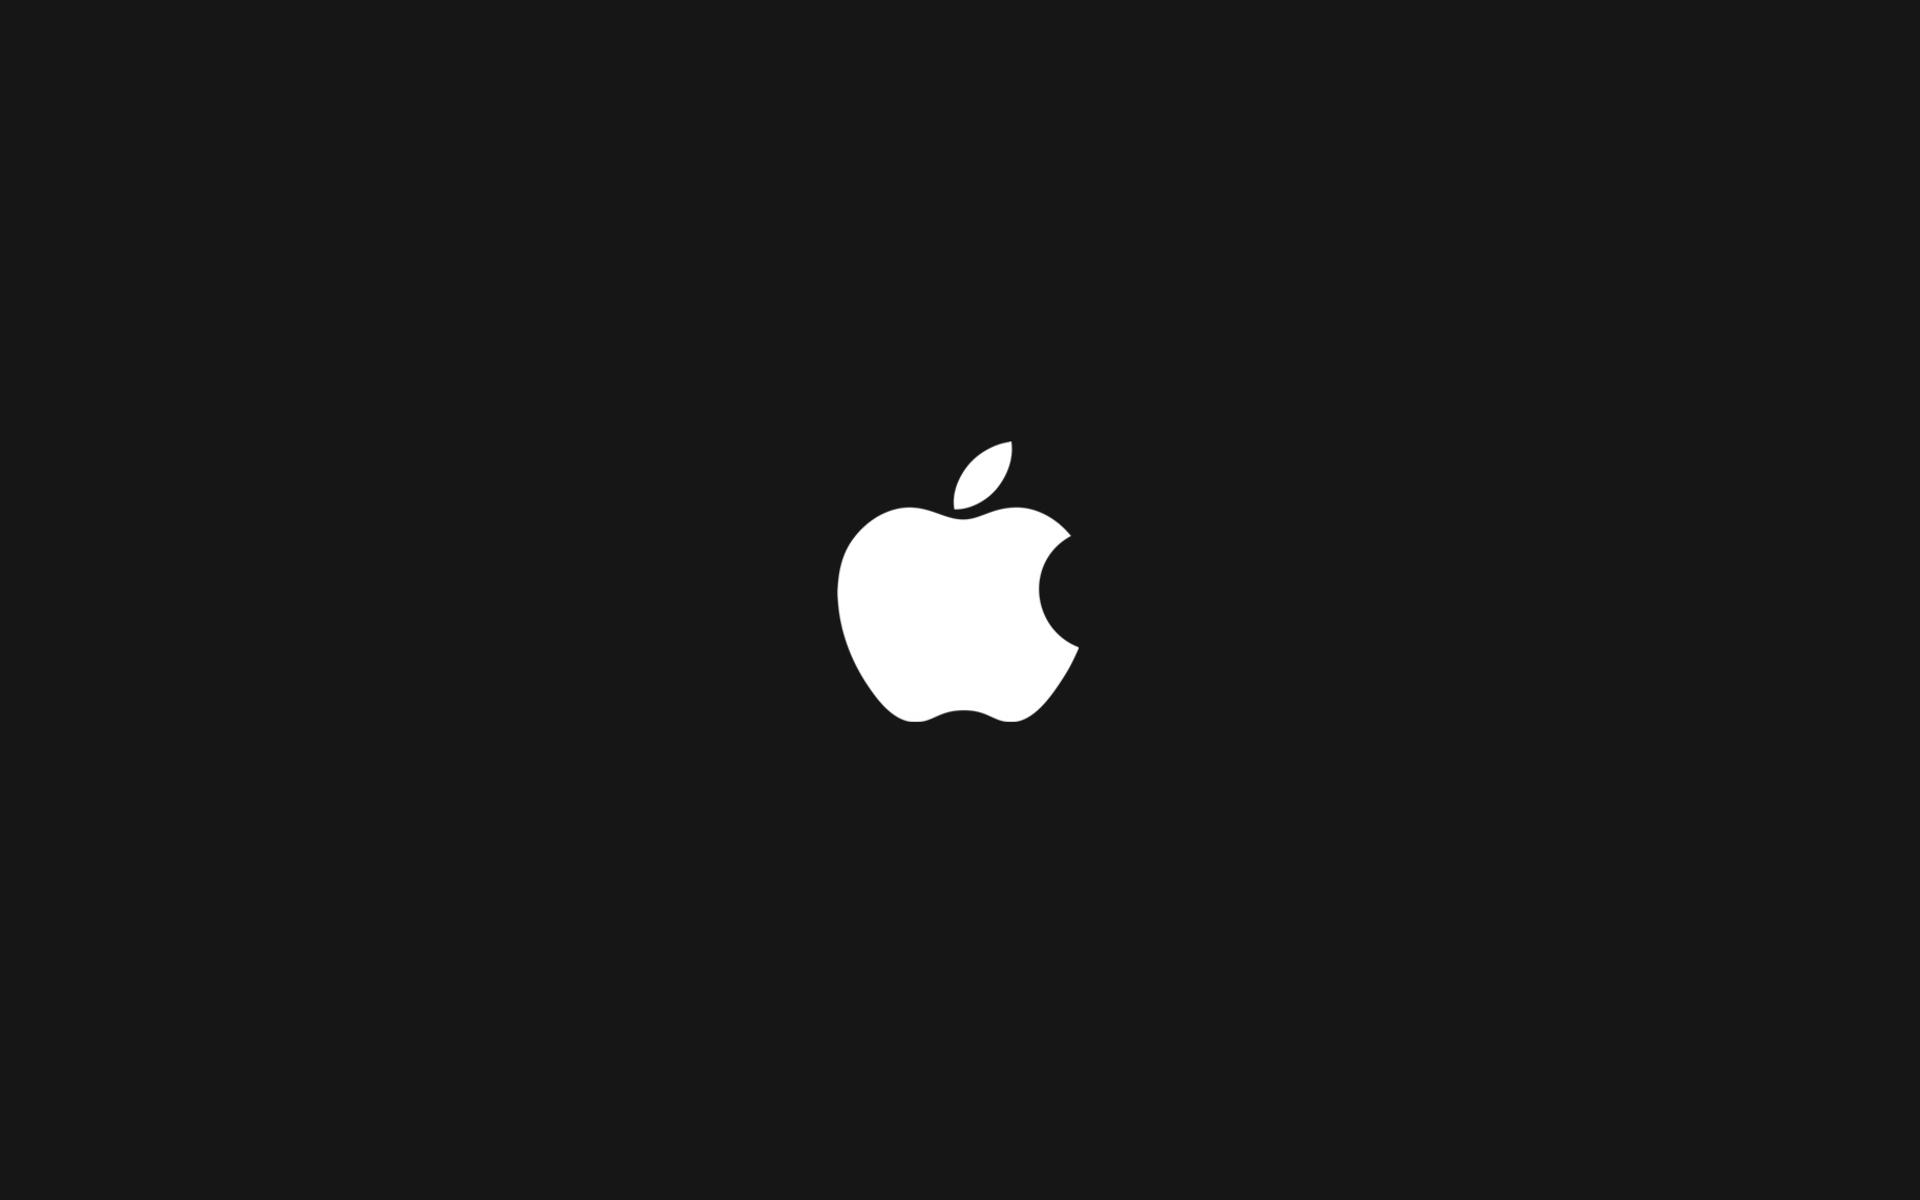 Find Greyhound Network Radio on Apple iTunes: Here's How